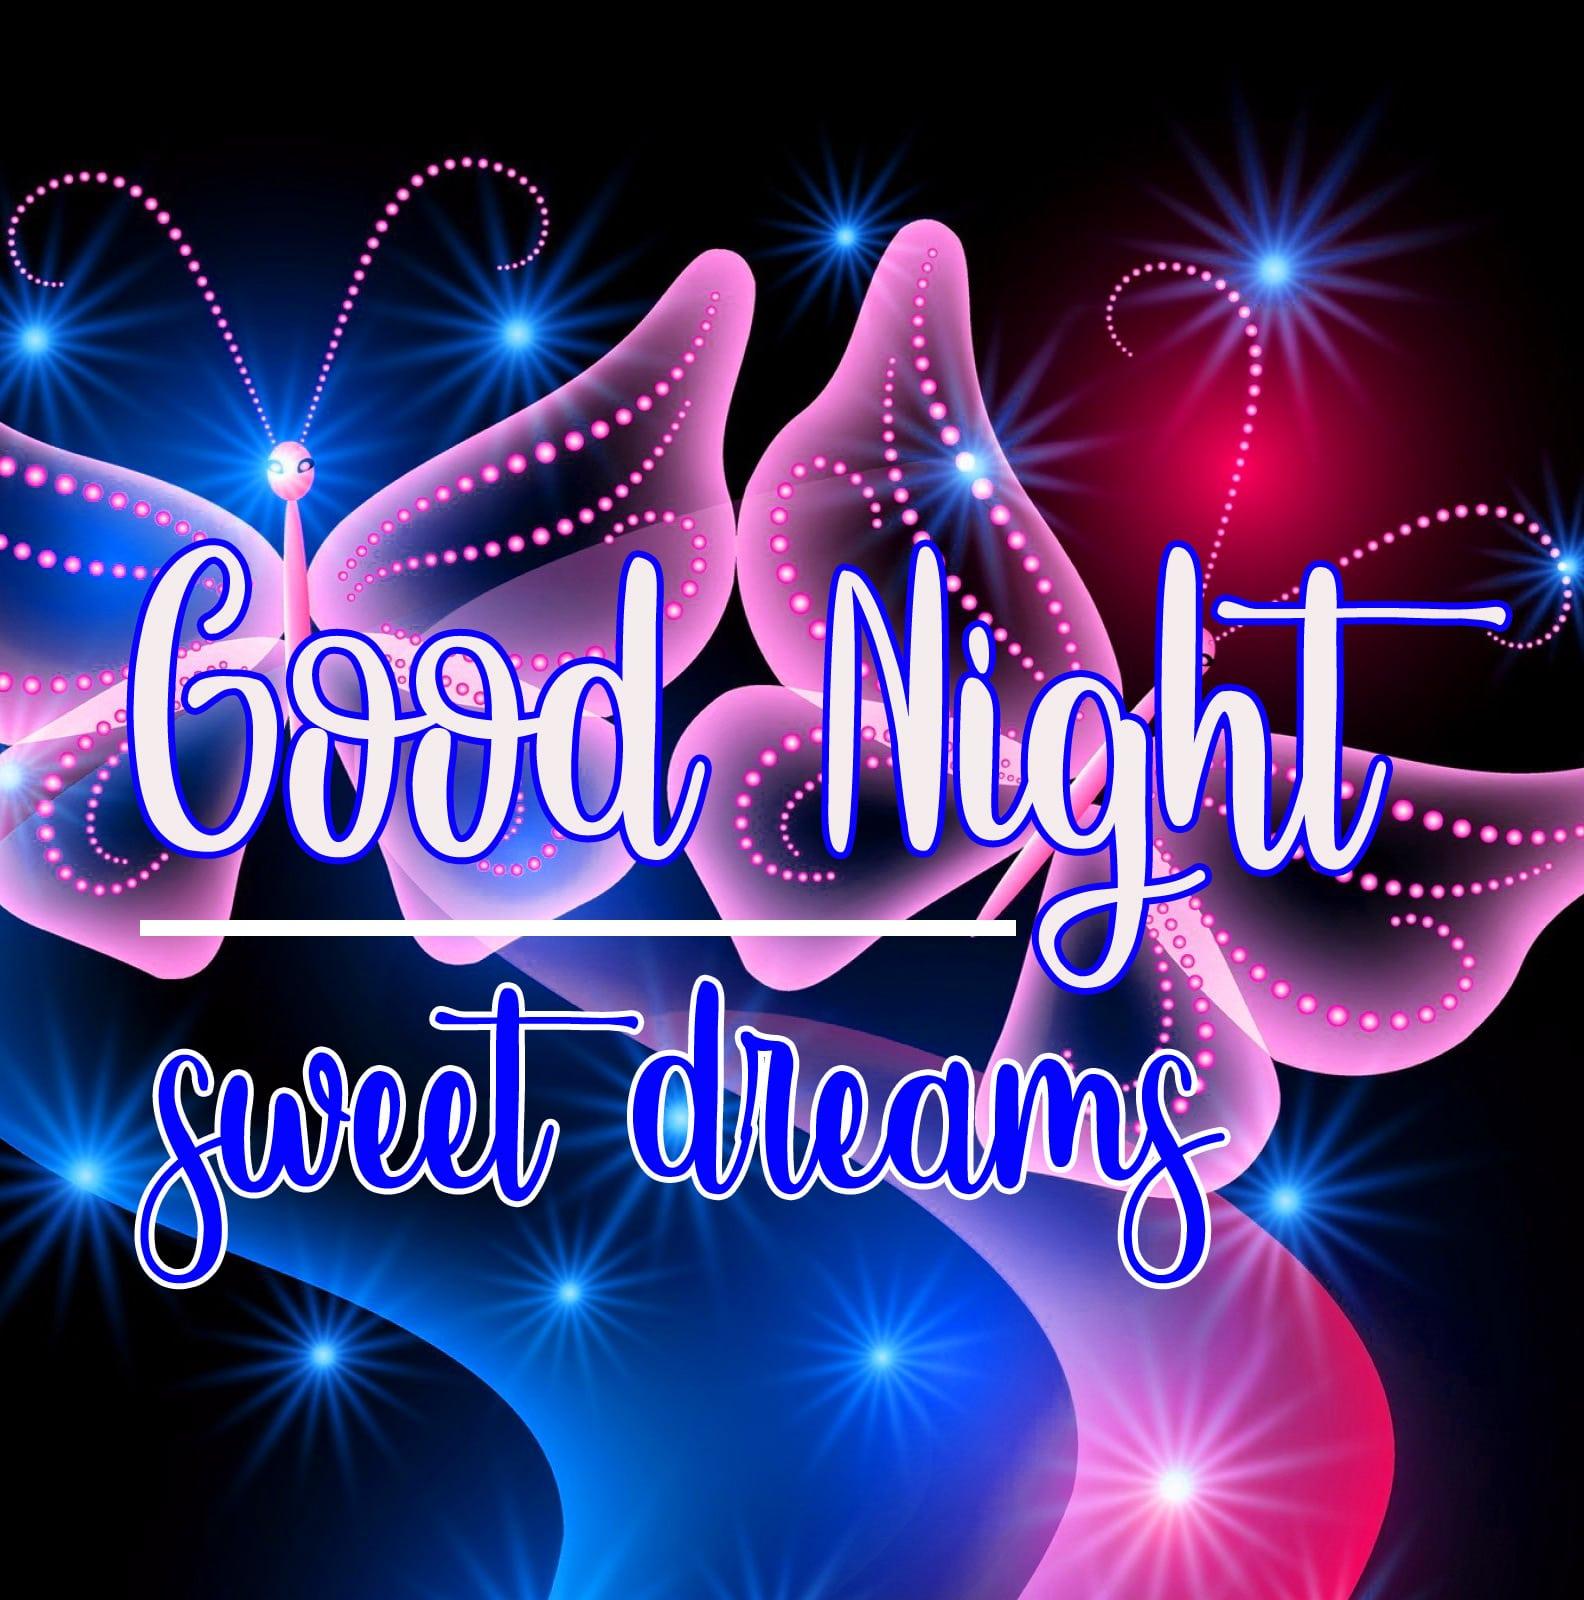 Good Night photo 3